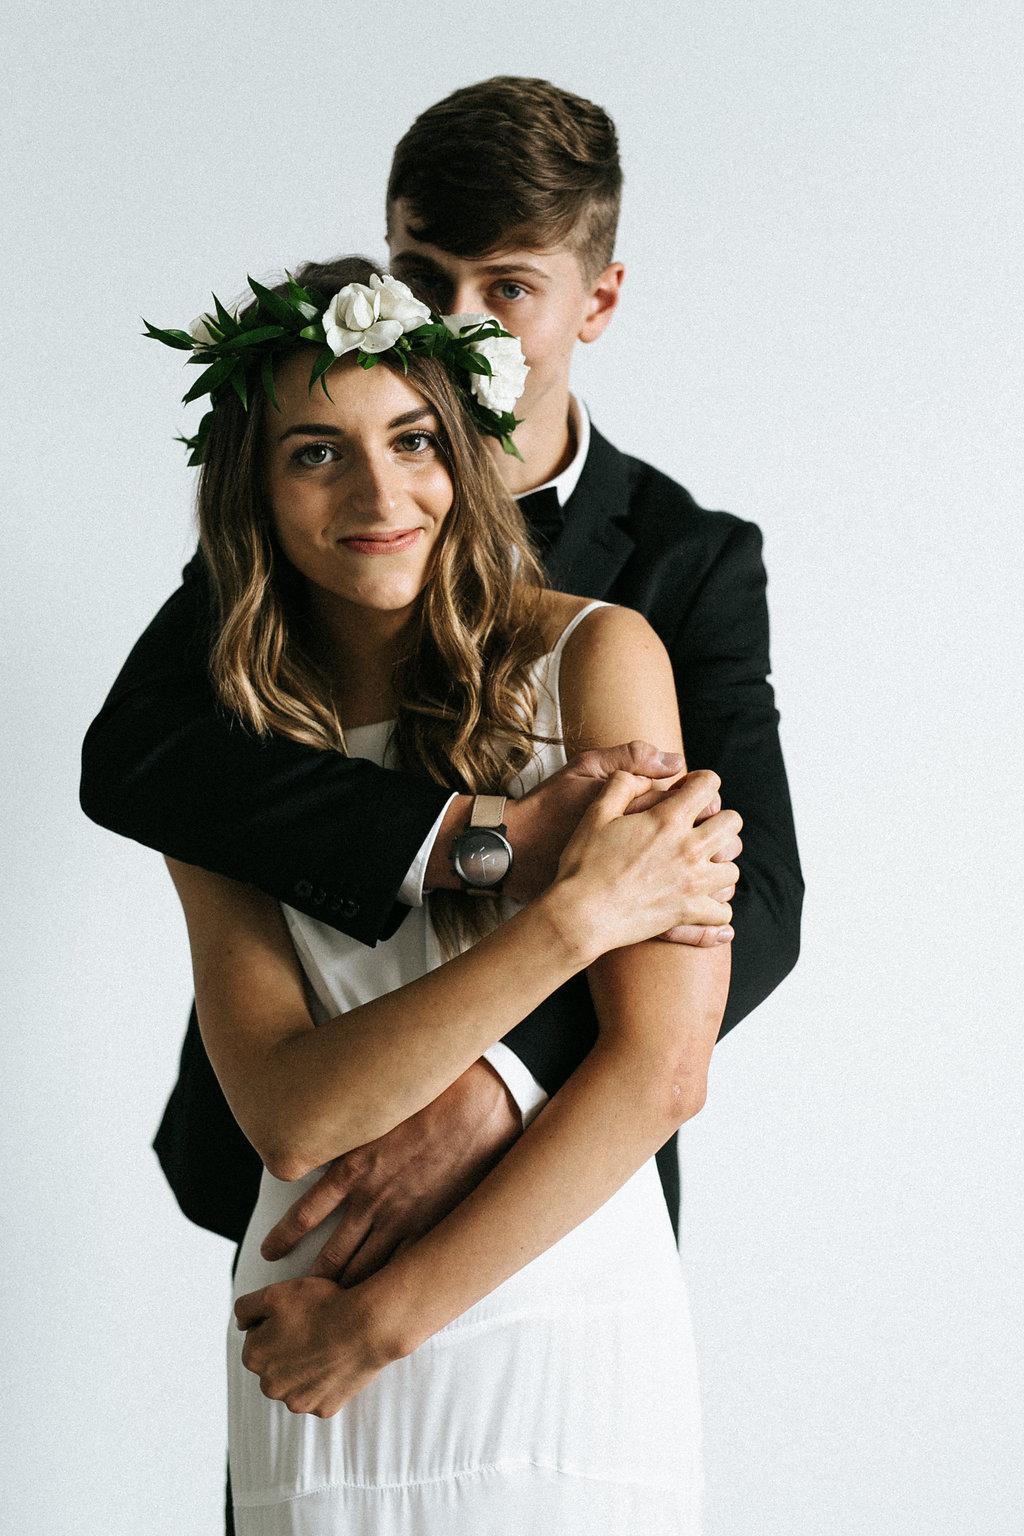 justin&emily-wedding-391.jpg